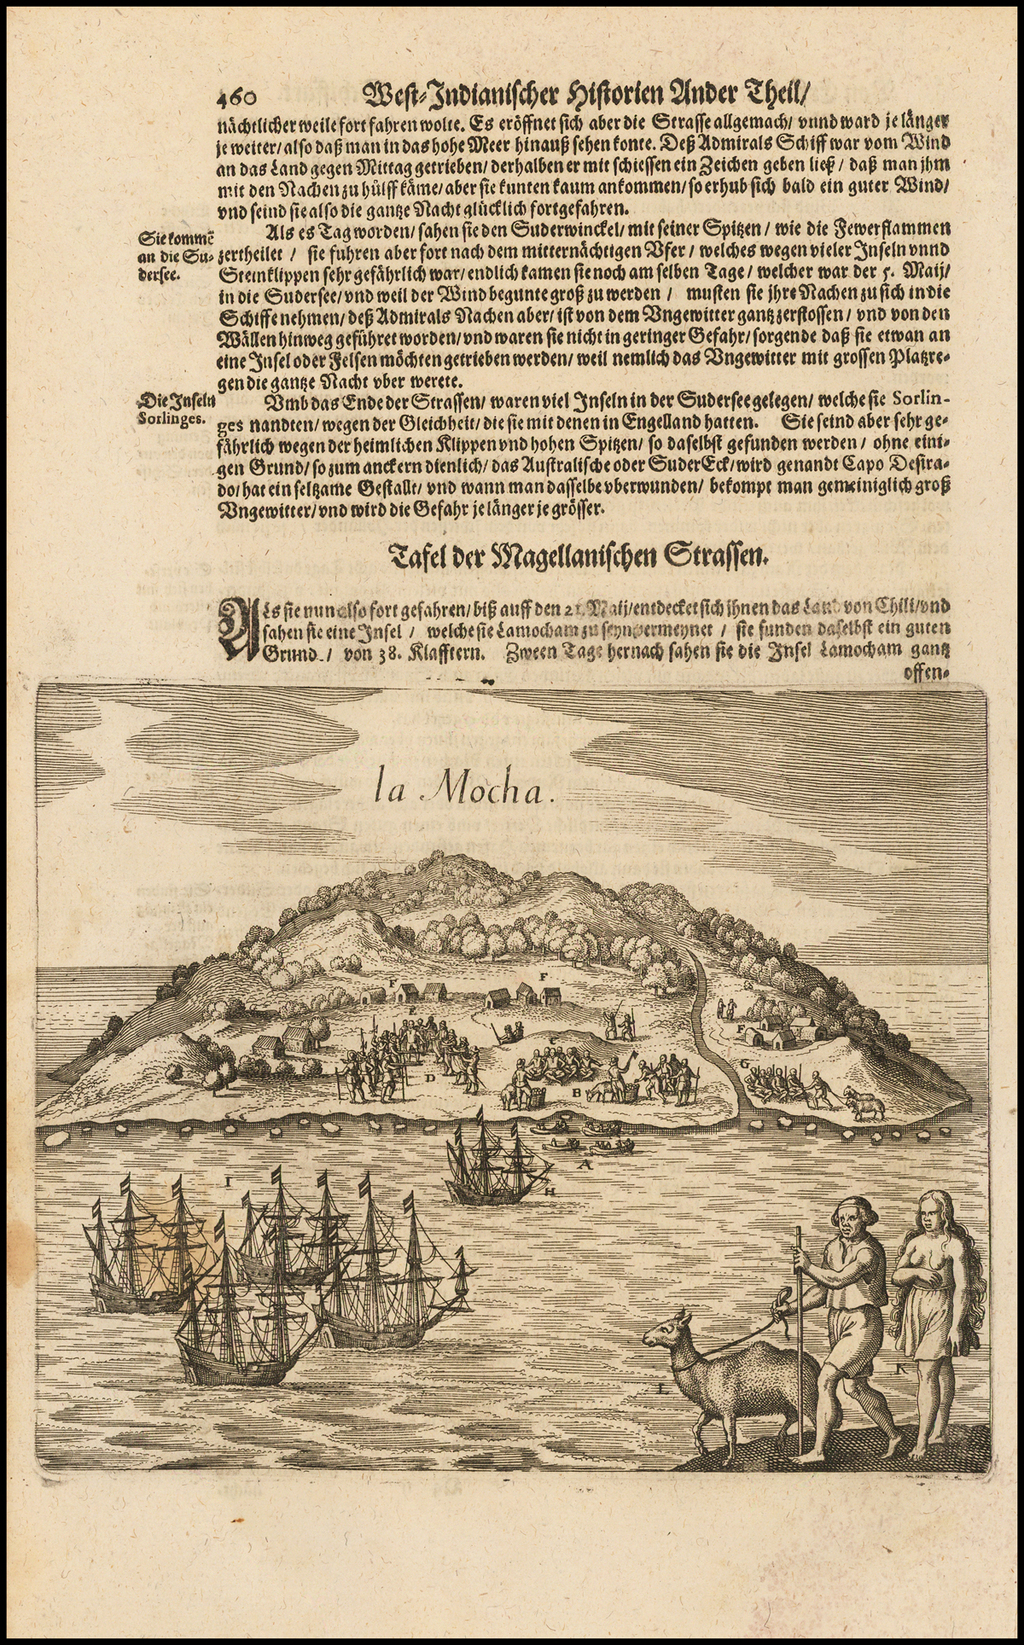 La Mocha (Mocha Island) By Matthaus Merian